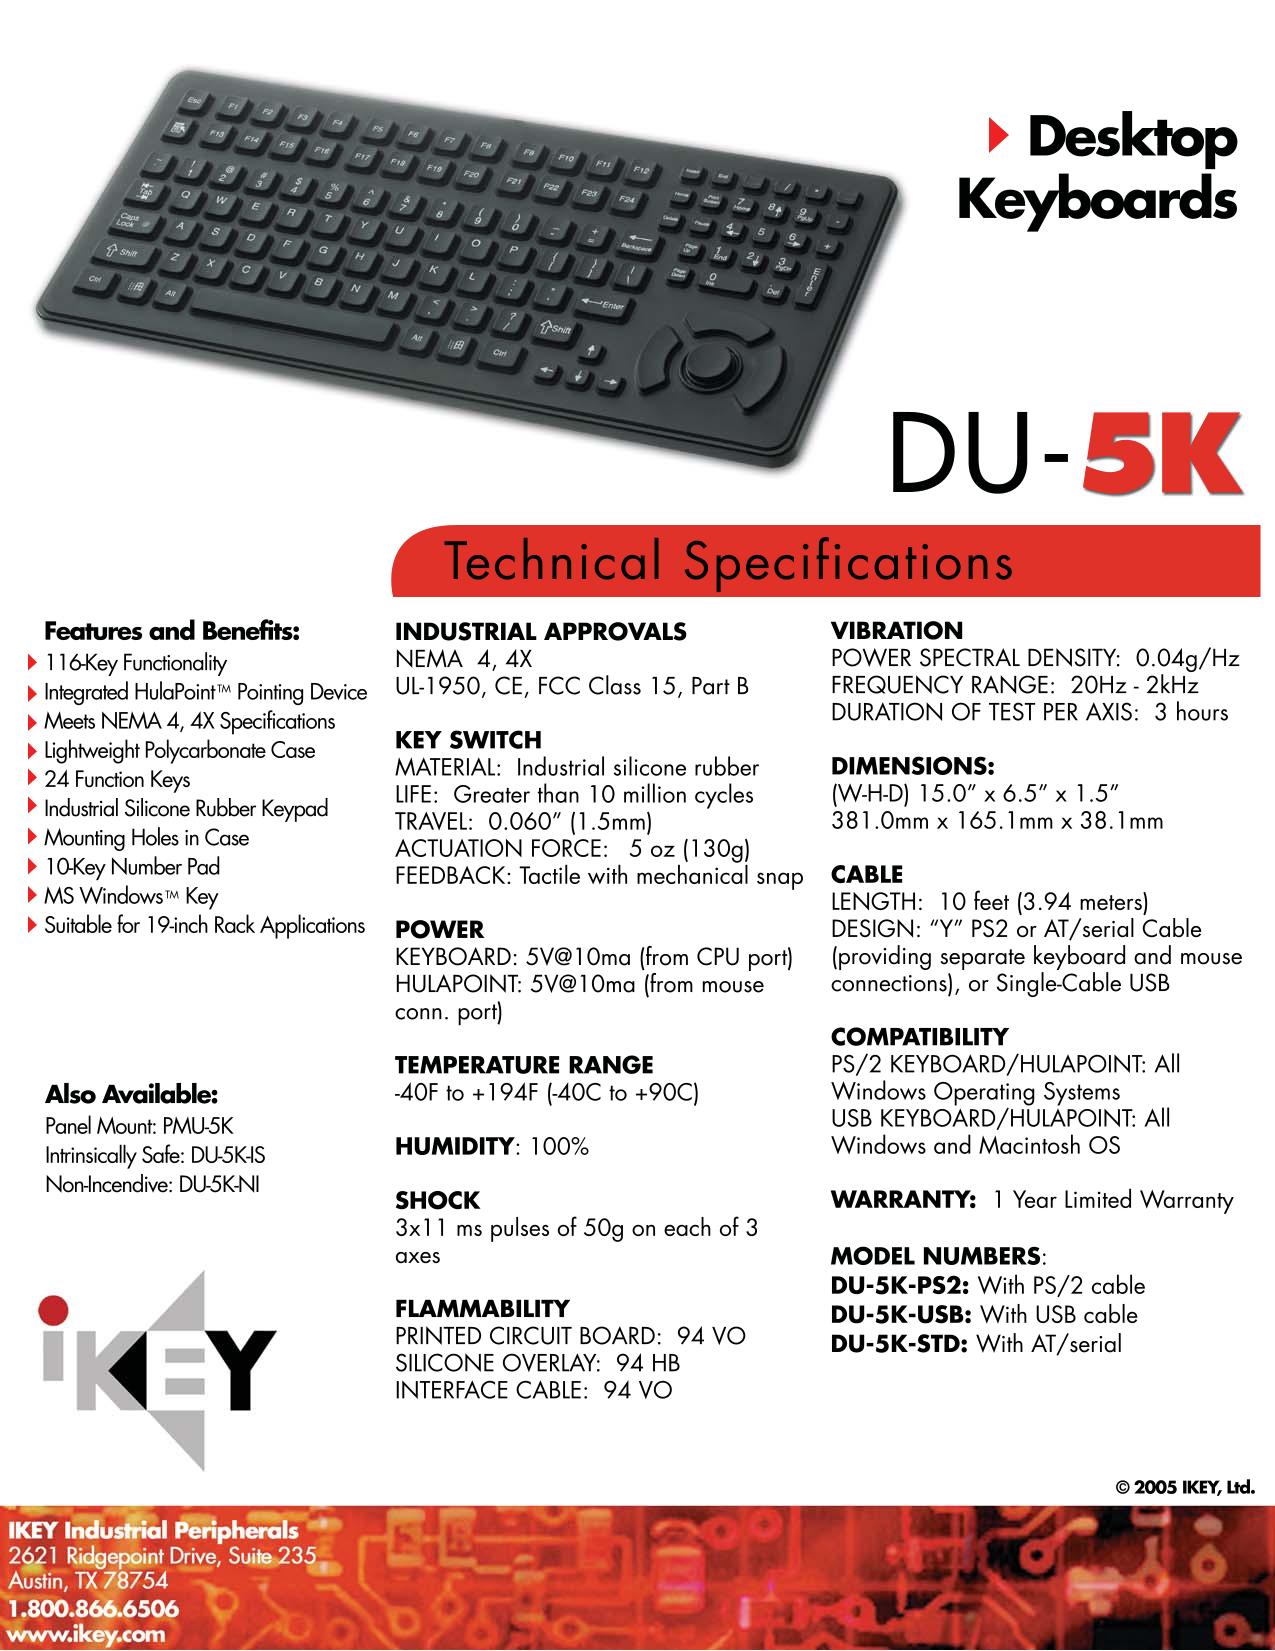 pdf for iKey Keyboard DU-5K manual